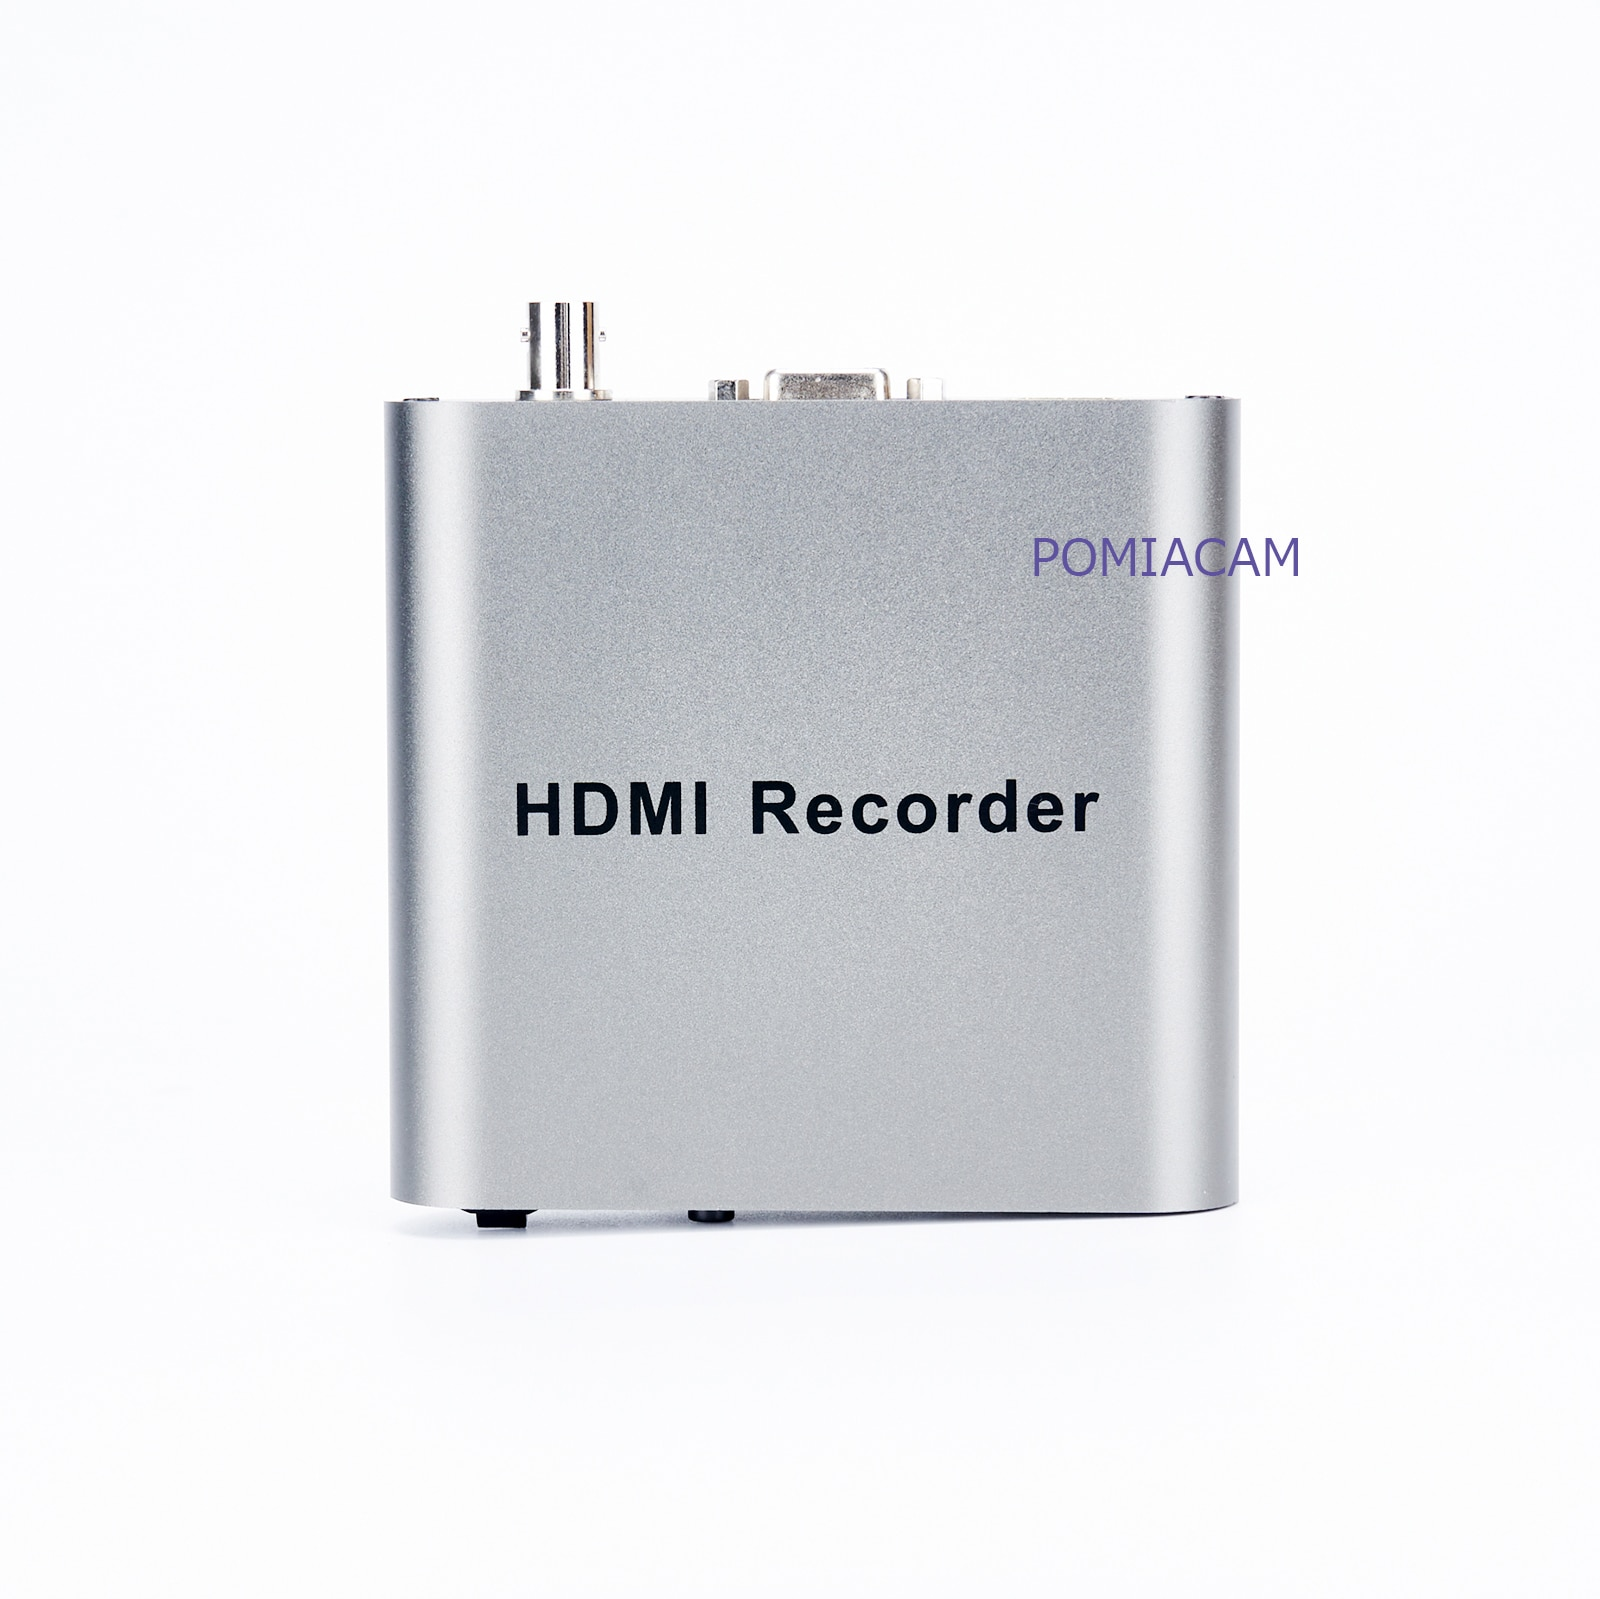 1080P 720P HDMI Recorder USB2.0 VGA-to-usb HDMI Cvbs Video Recording Box 4/6/8Mbps Games Video Recorder for Phone,camera,TV-box enlarge